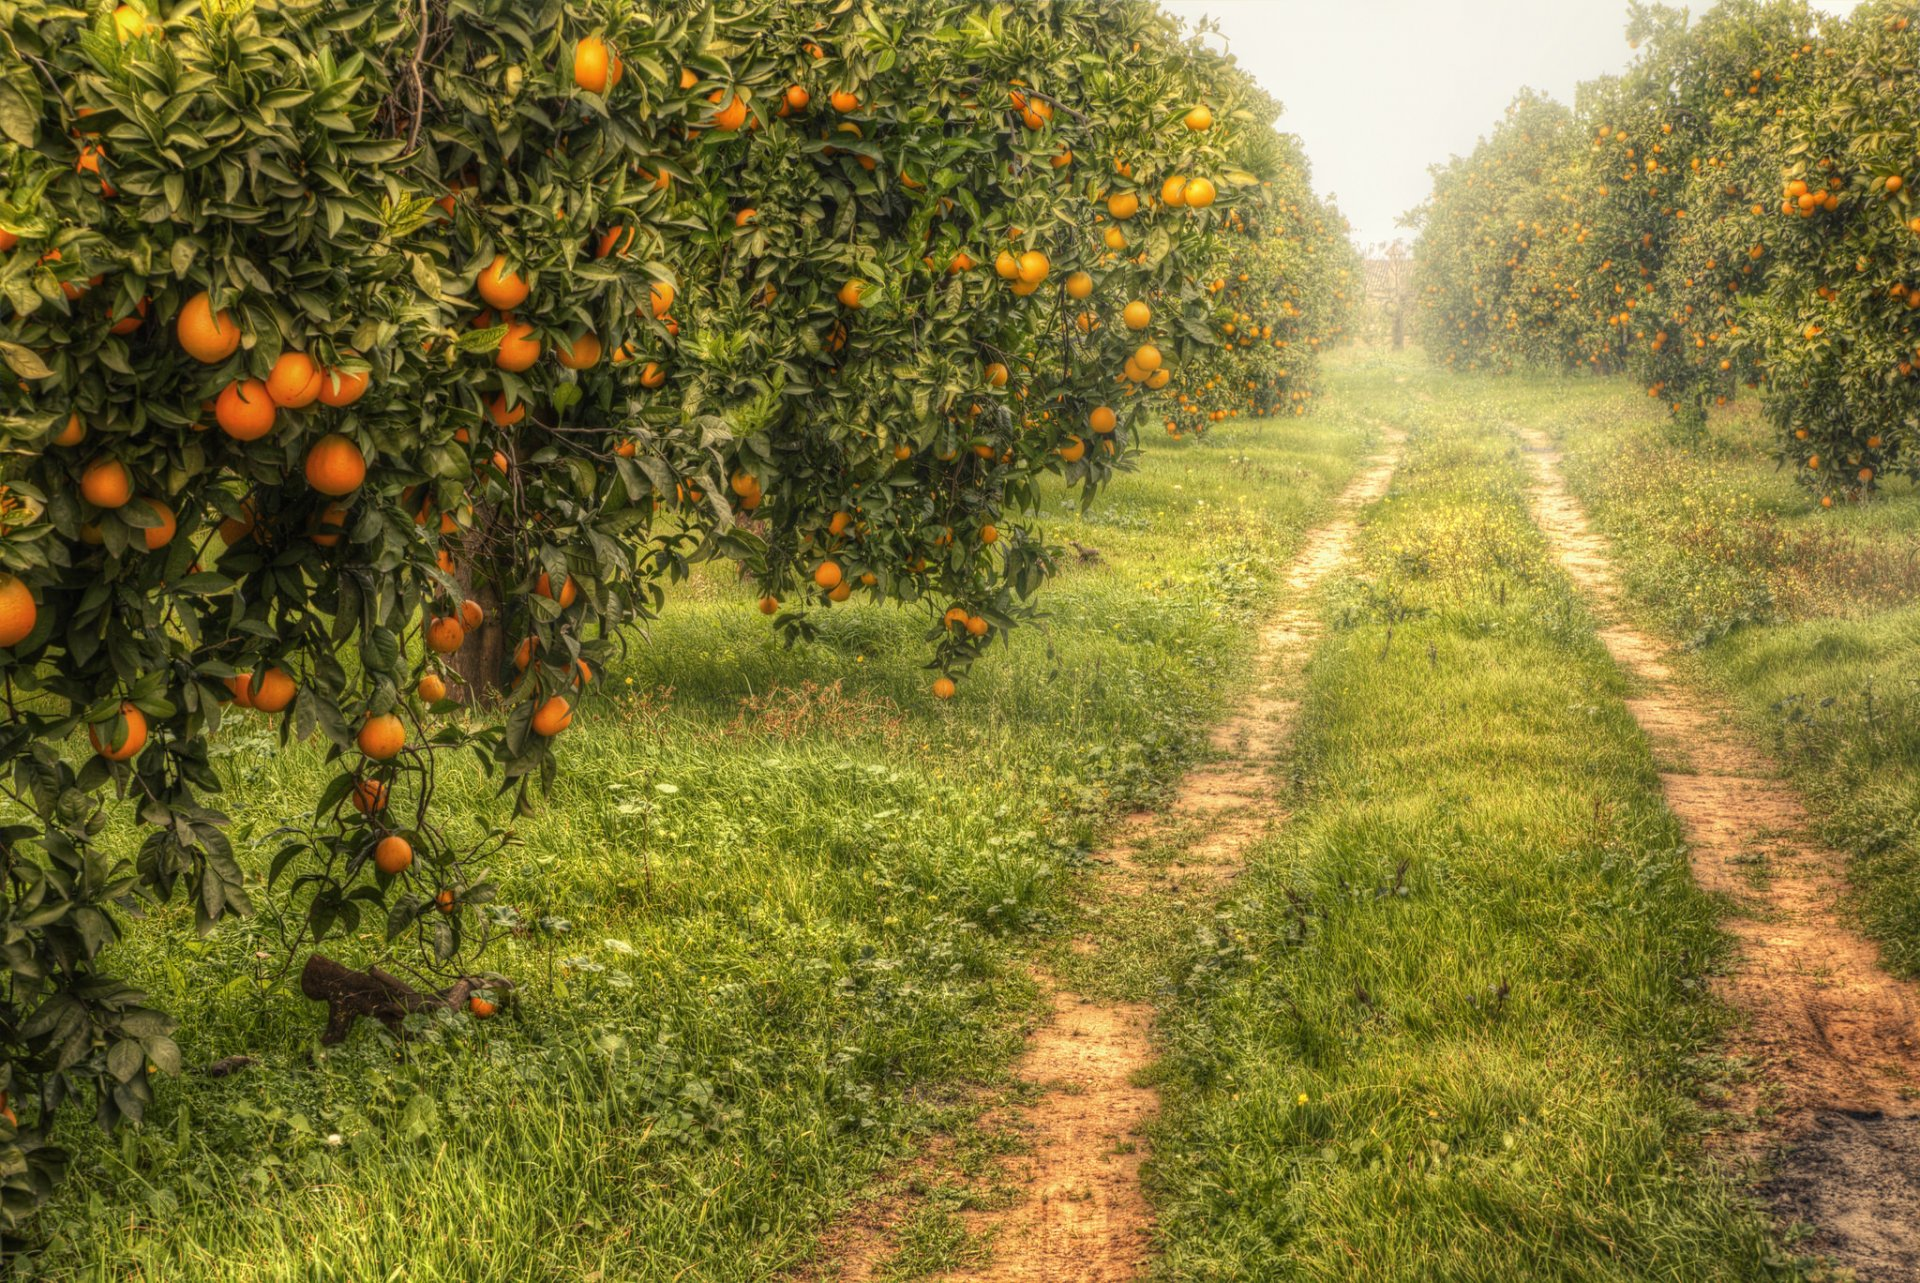 сад мандарины природа HD обои для ноутбука  Фруктовый Сад Обои